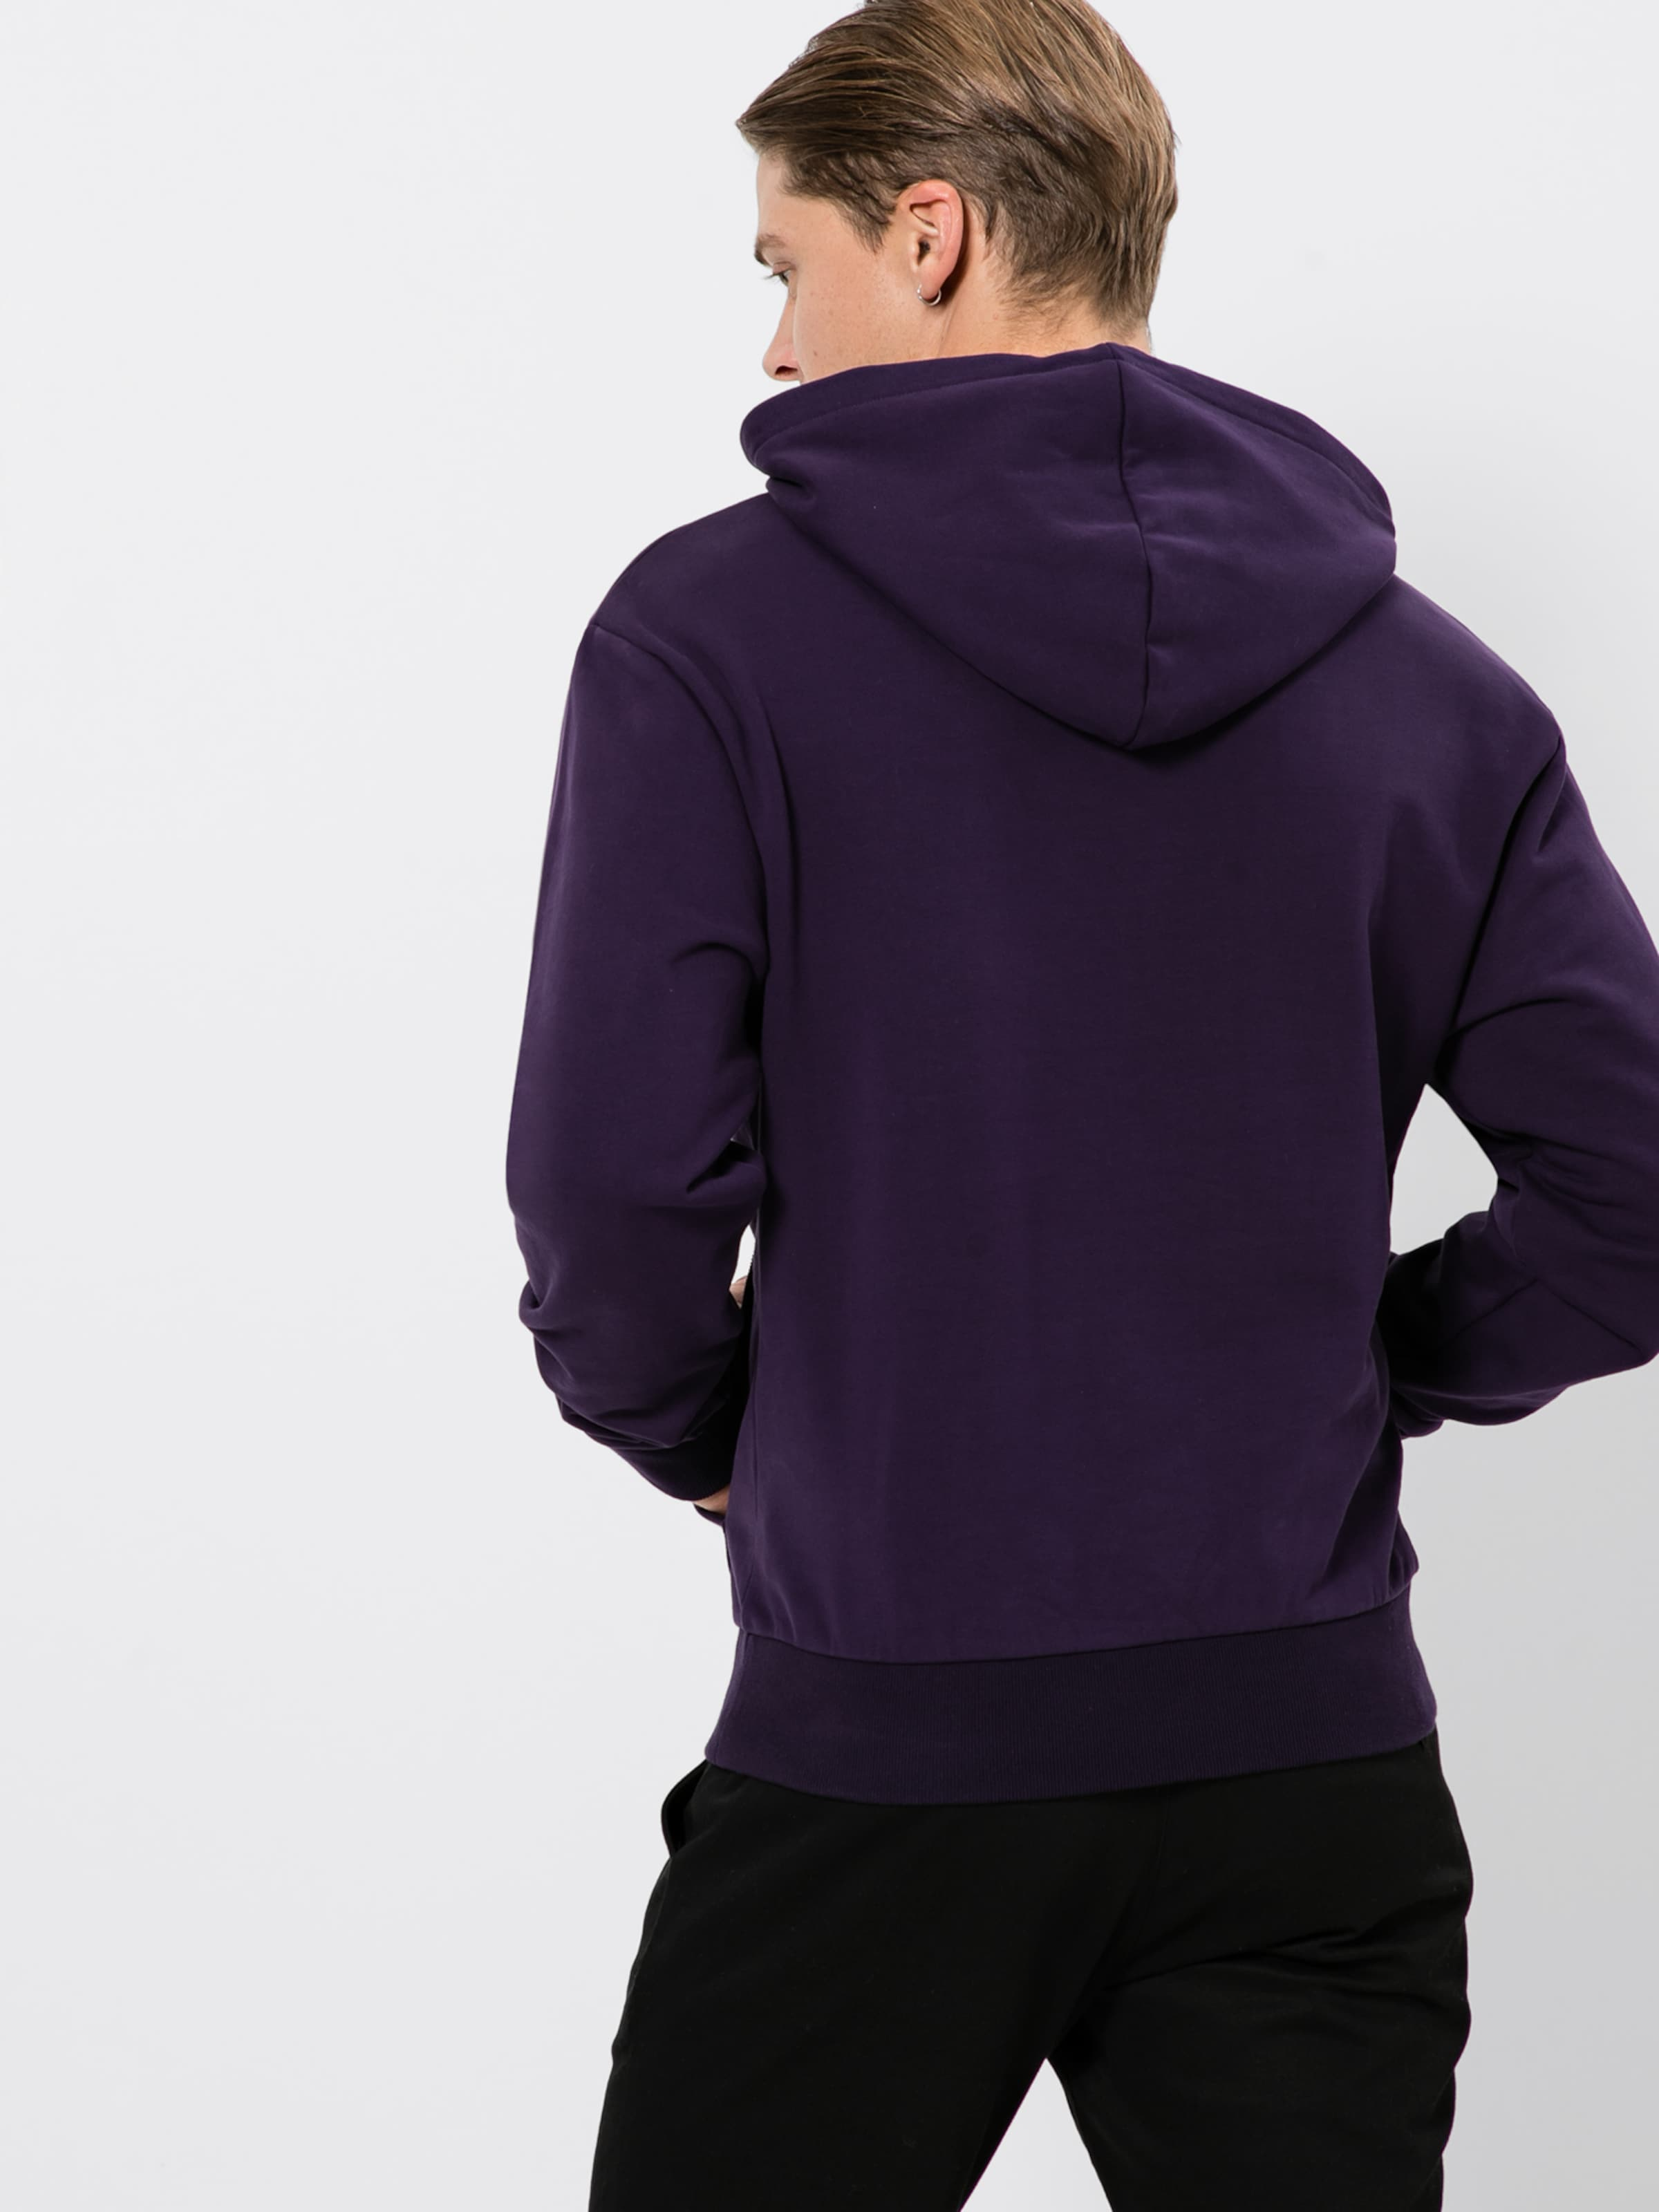 The Sweat shirt Violet Kooples En 3JTFlKc1